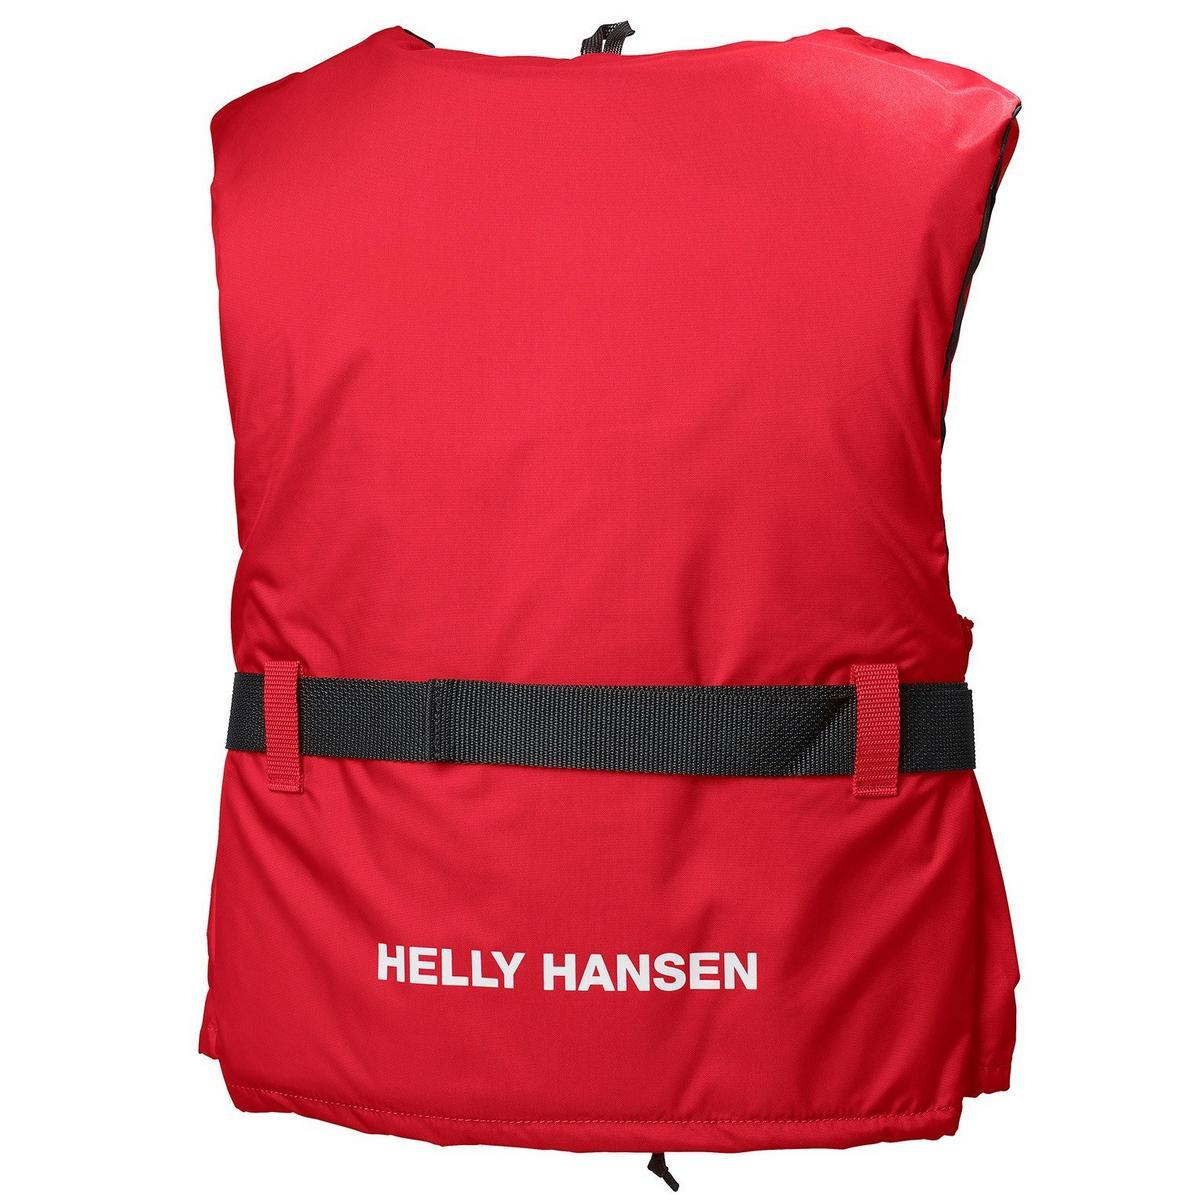 Helly Hansen Sport II PFD - Red